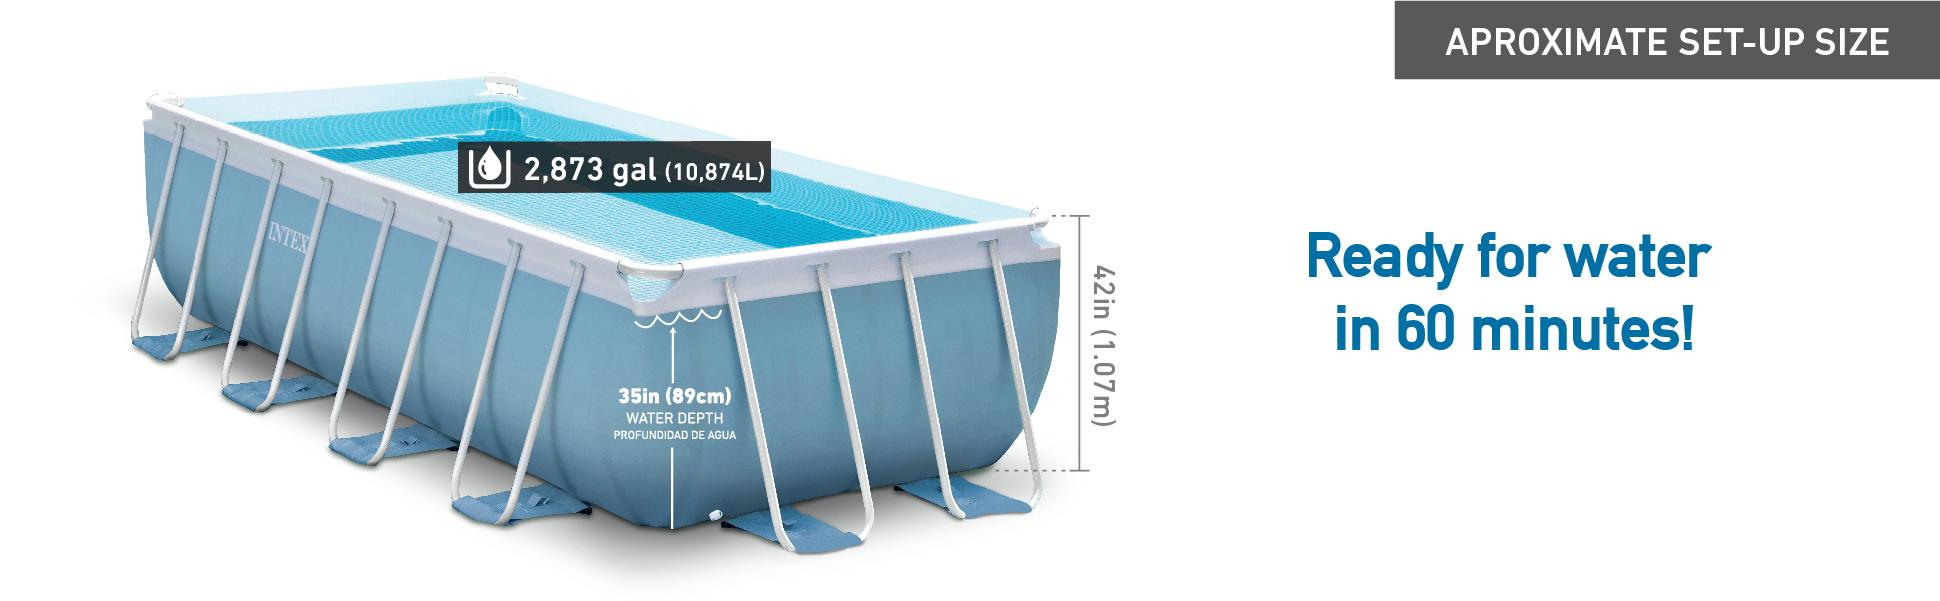 Amazon Com Intex 16ft X 8ft X 42in Prism Frame